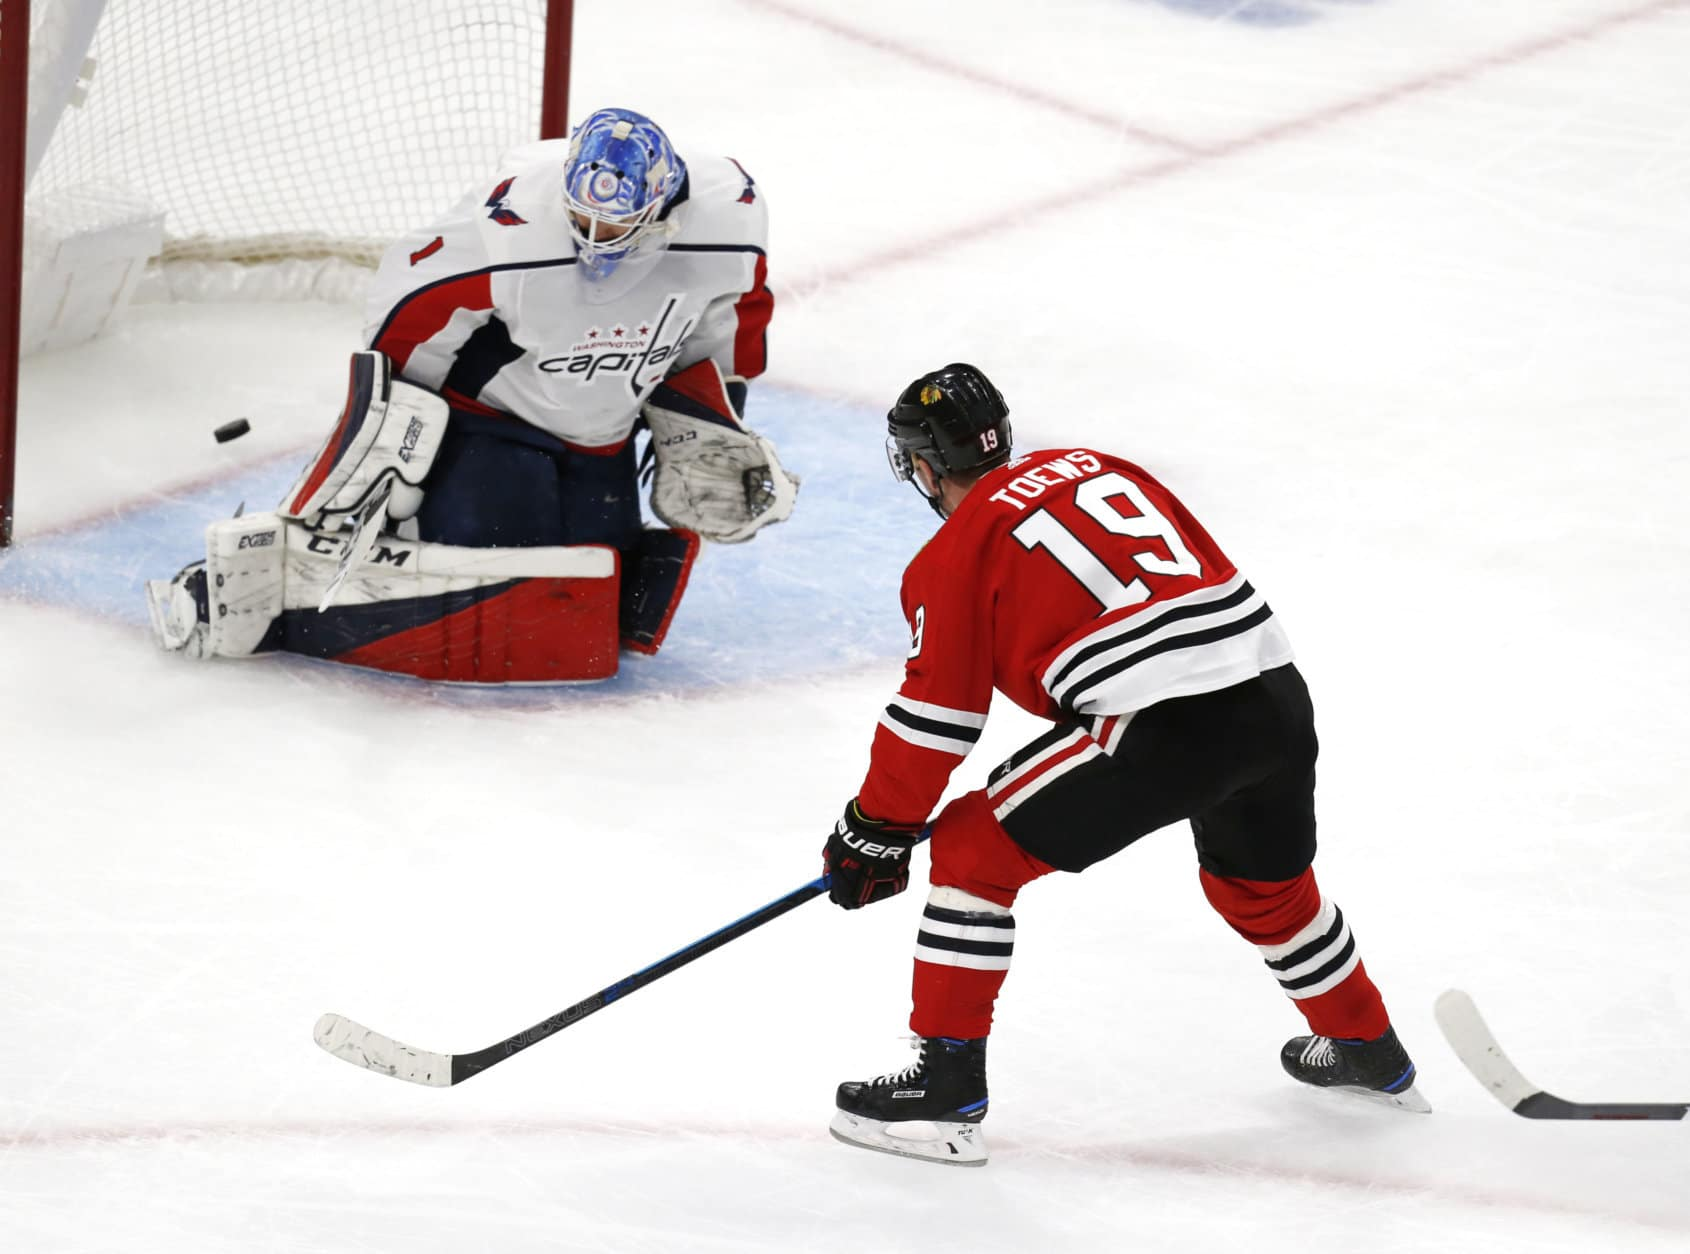 Chicago Blackhawks center Jonathan Toews (19) scores past Washington Capitals goaltender Pheonix Copley (1) during the third period of an NHL hockey game Sunday, Jan. 20, 2019, in Chicago. (AP Photo Nuccio DiNuzzo)